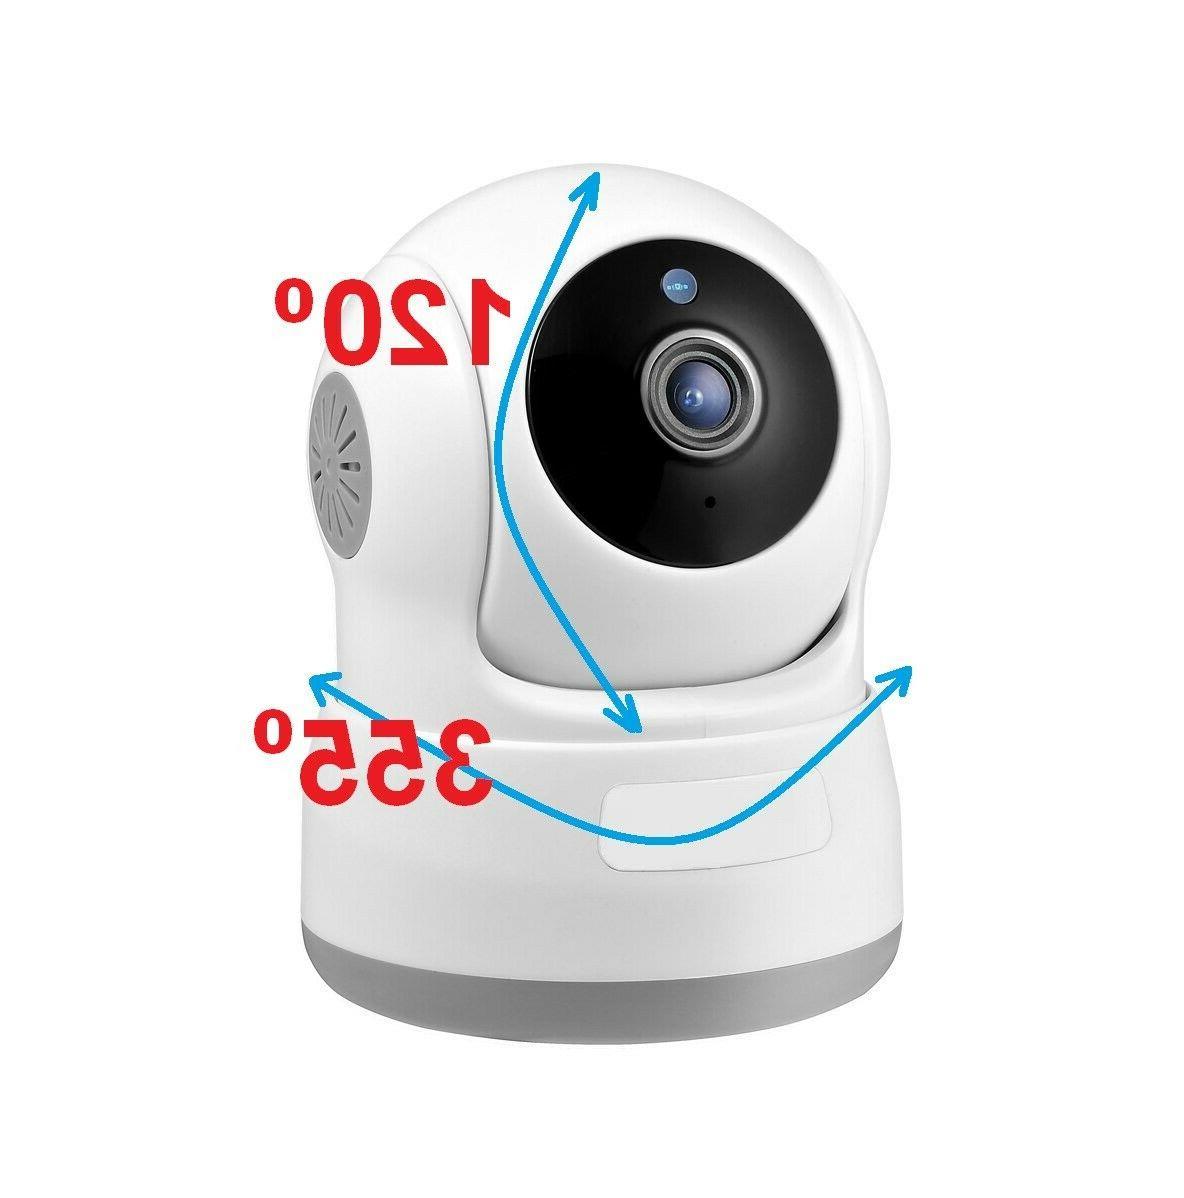 4 HD Wireless Indoor NightVision Camera